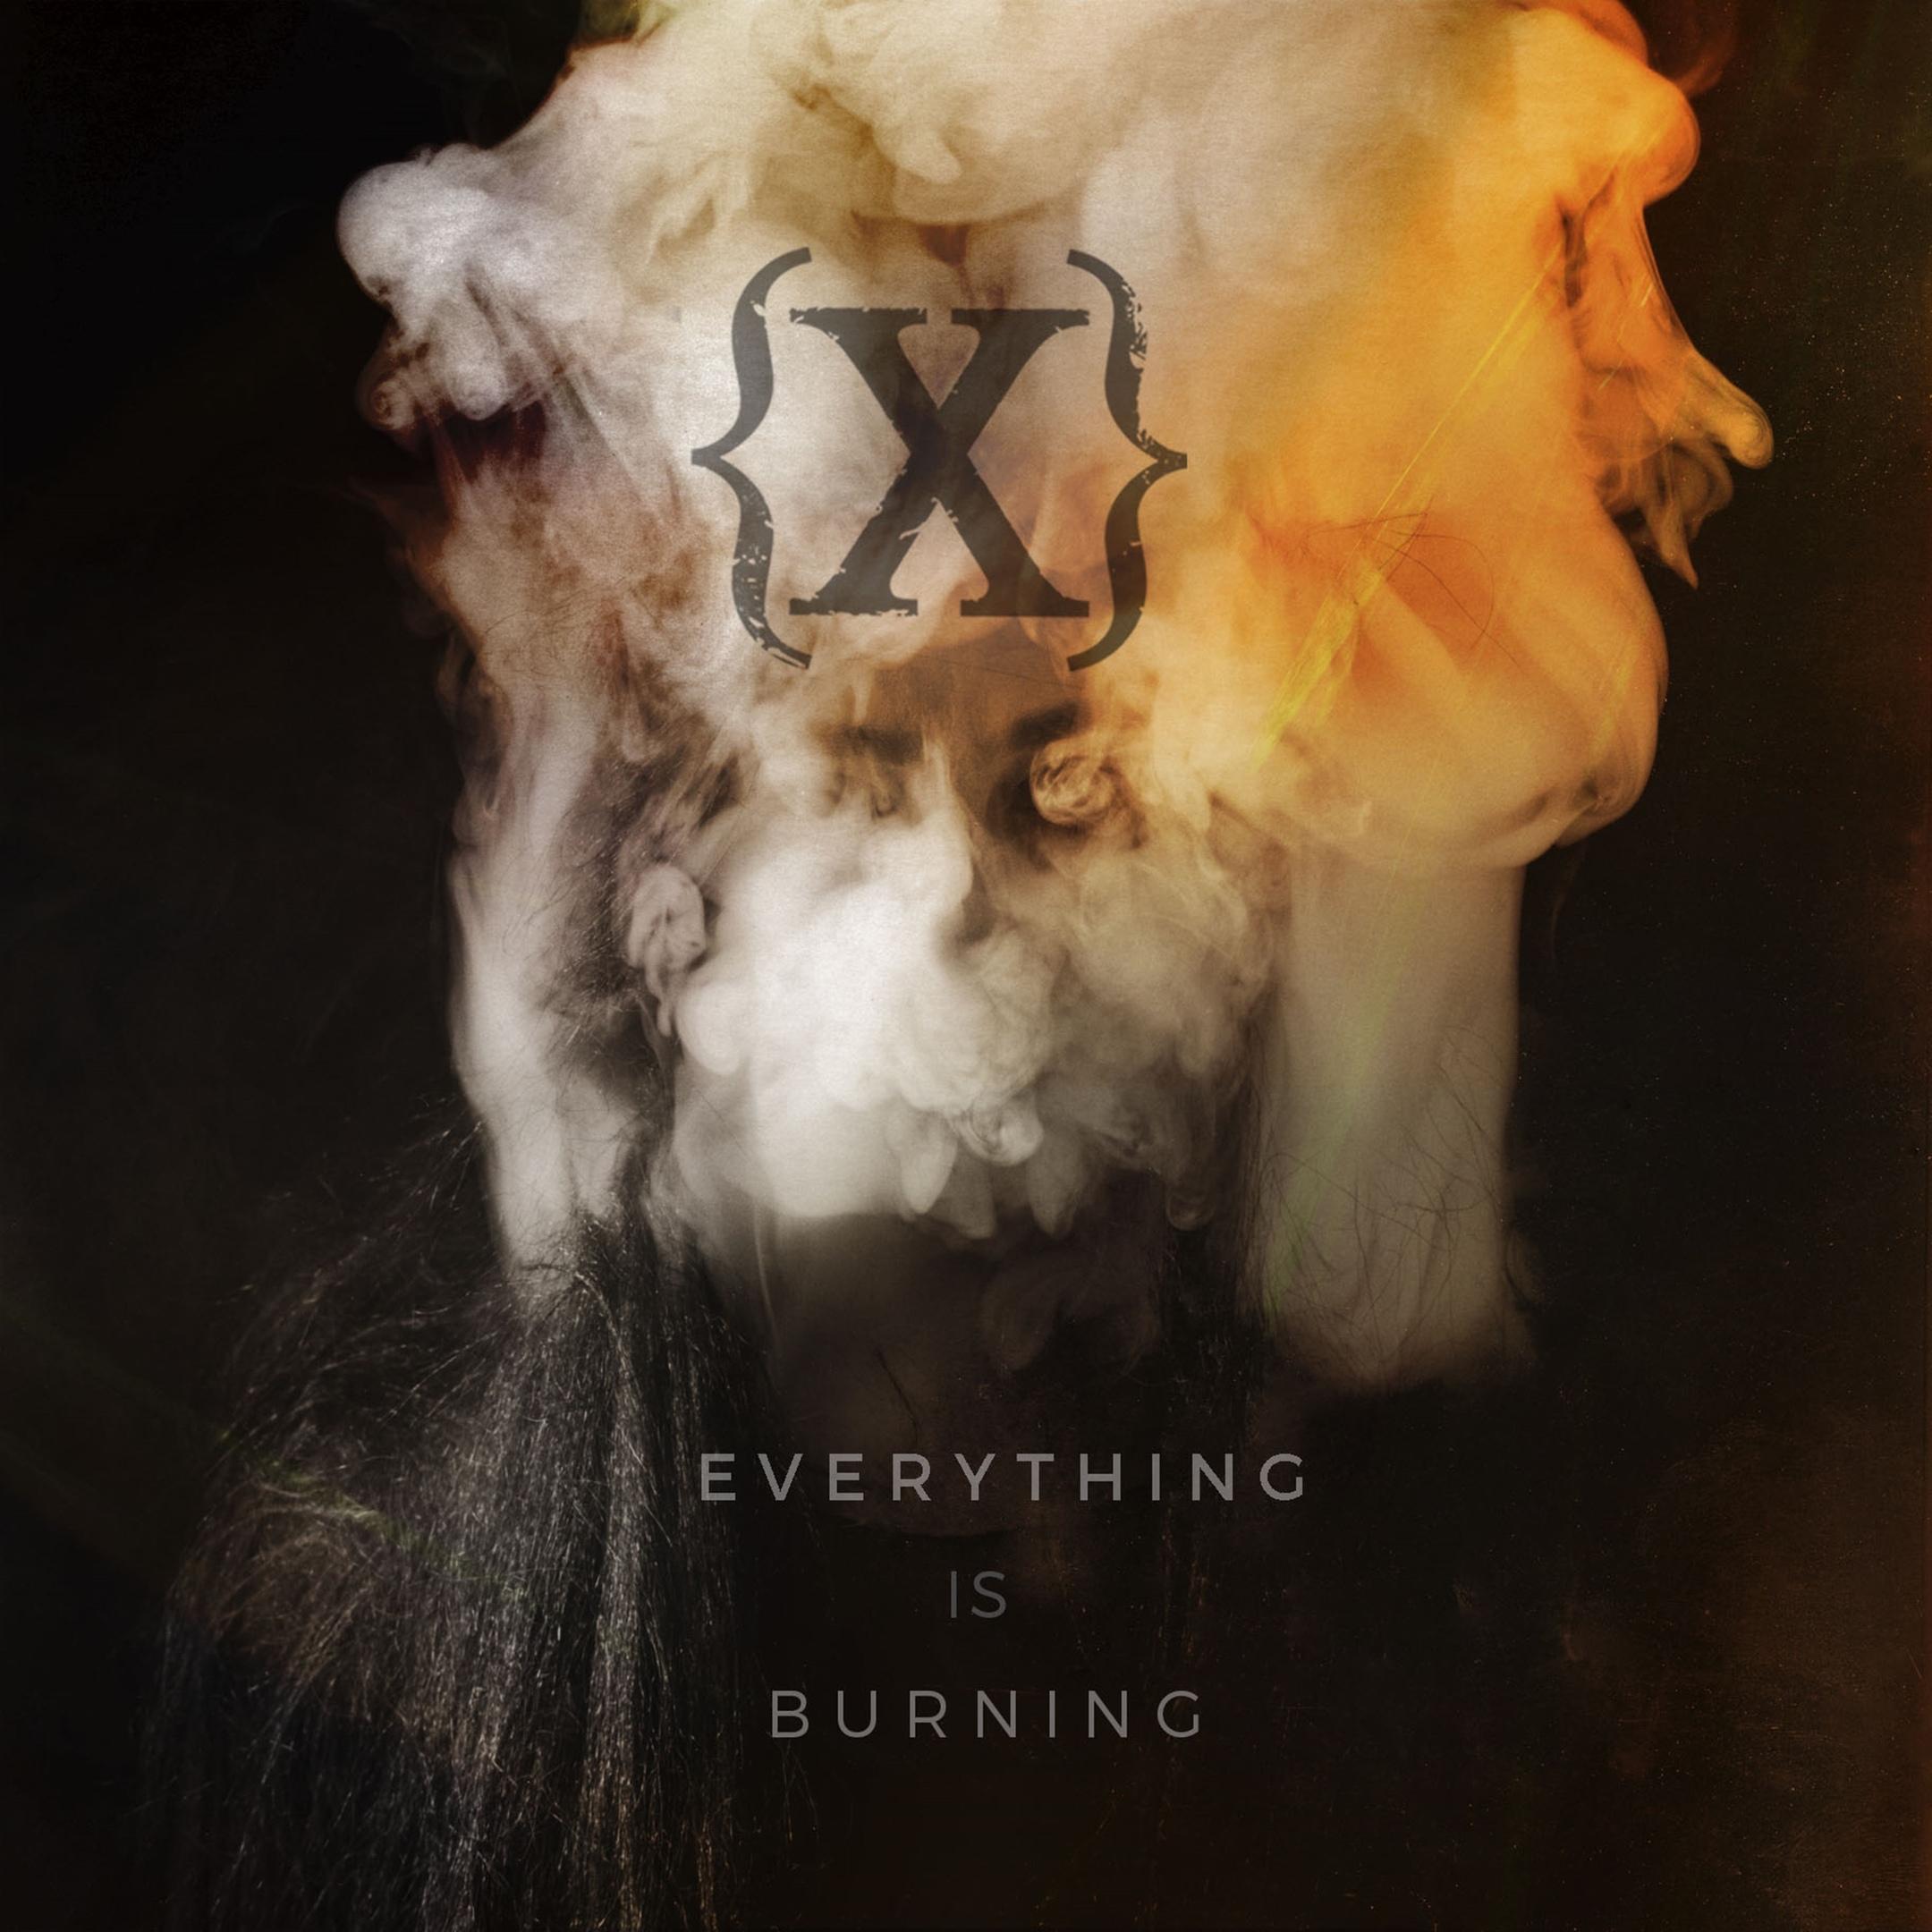 IAMX album Everything Is Burning (Metanoia Addendum)